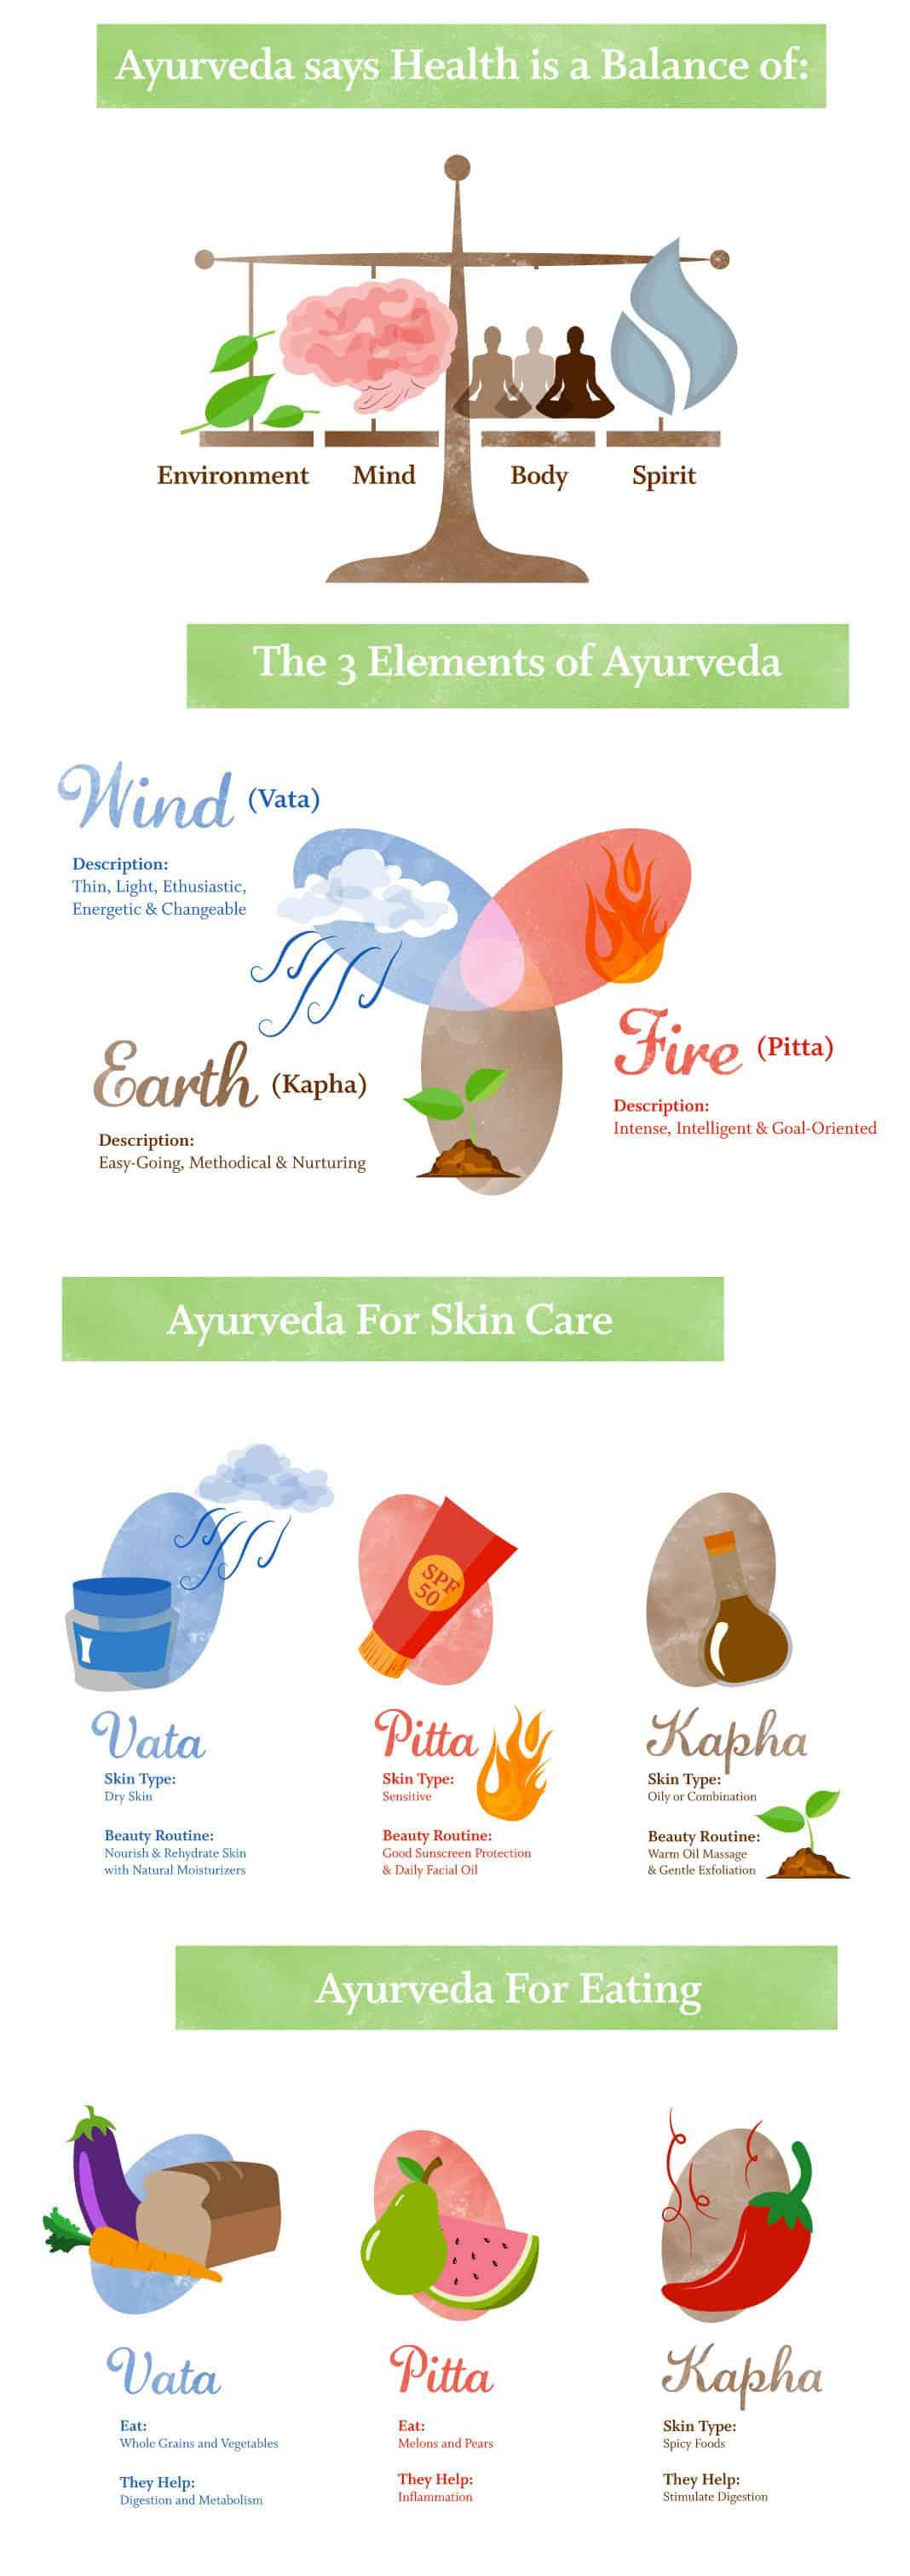 Ayurvedic Beauty Routine - All About Ayurveda Beauty